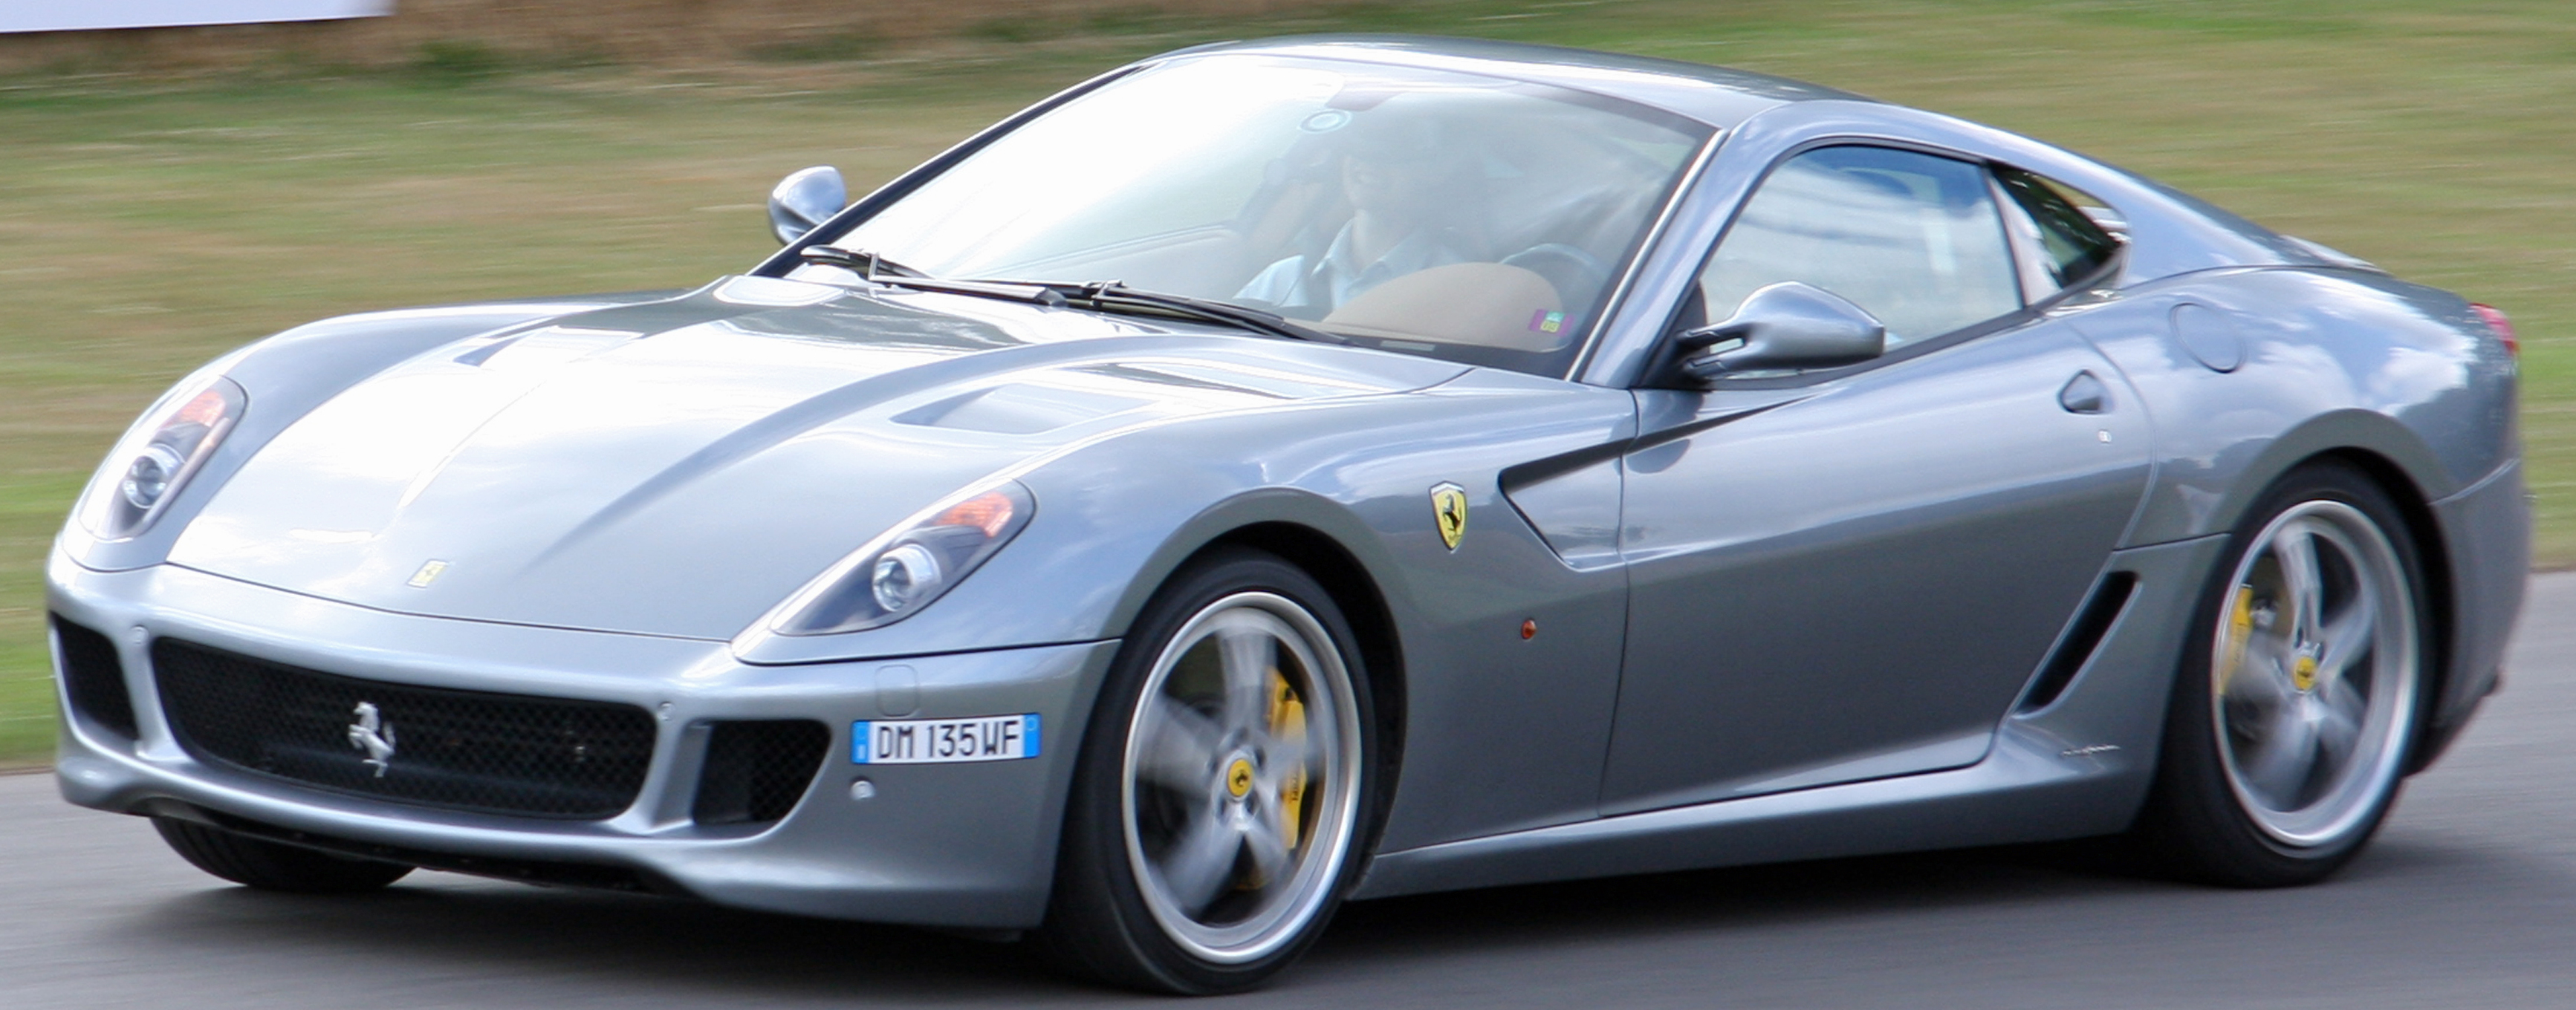 File Ferrari 599 Hgte Jpg Wikimedia Commons